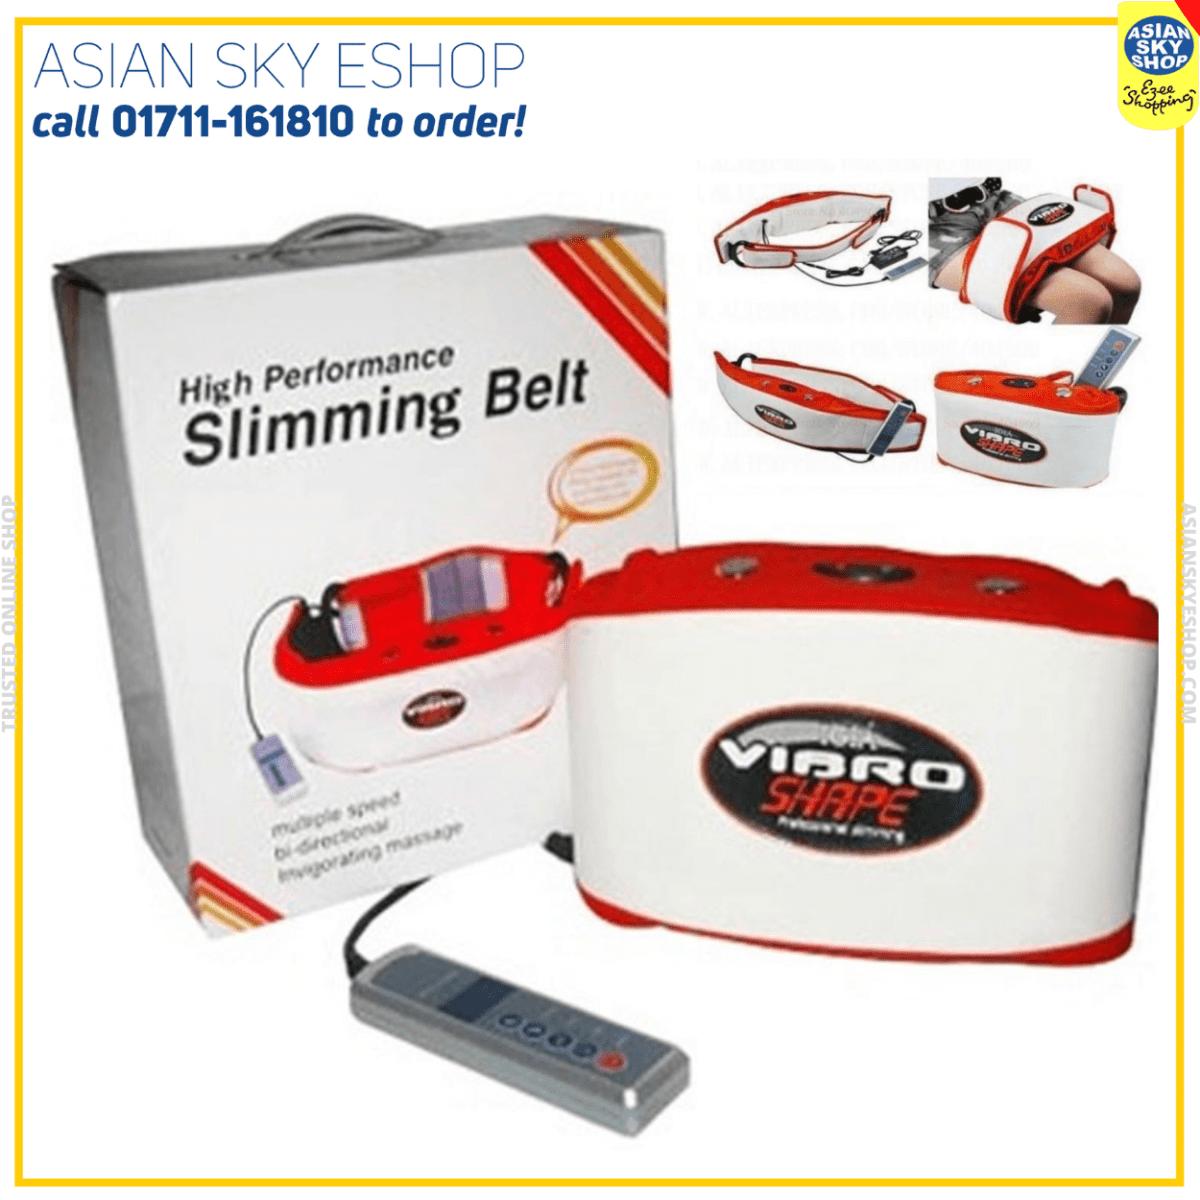 High Performance Slimming Belt